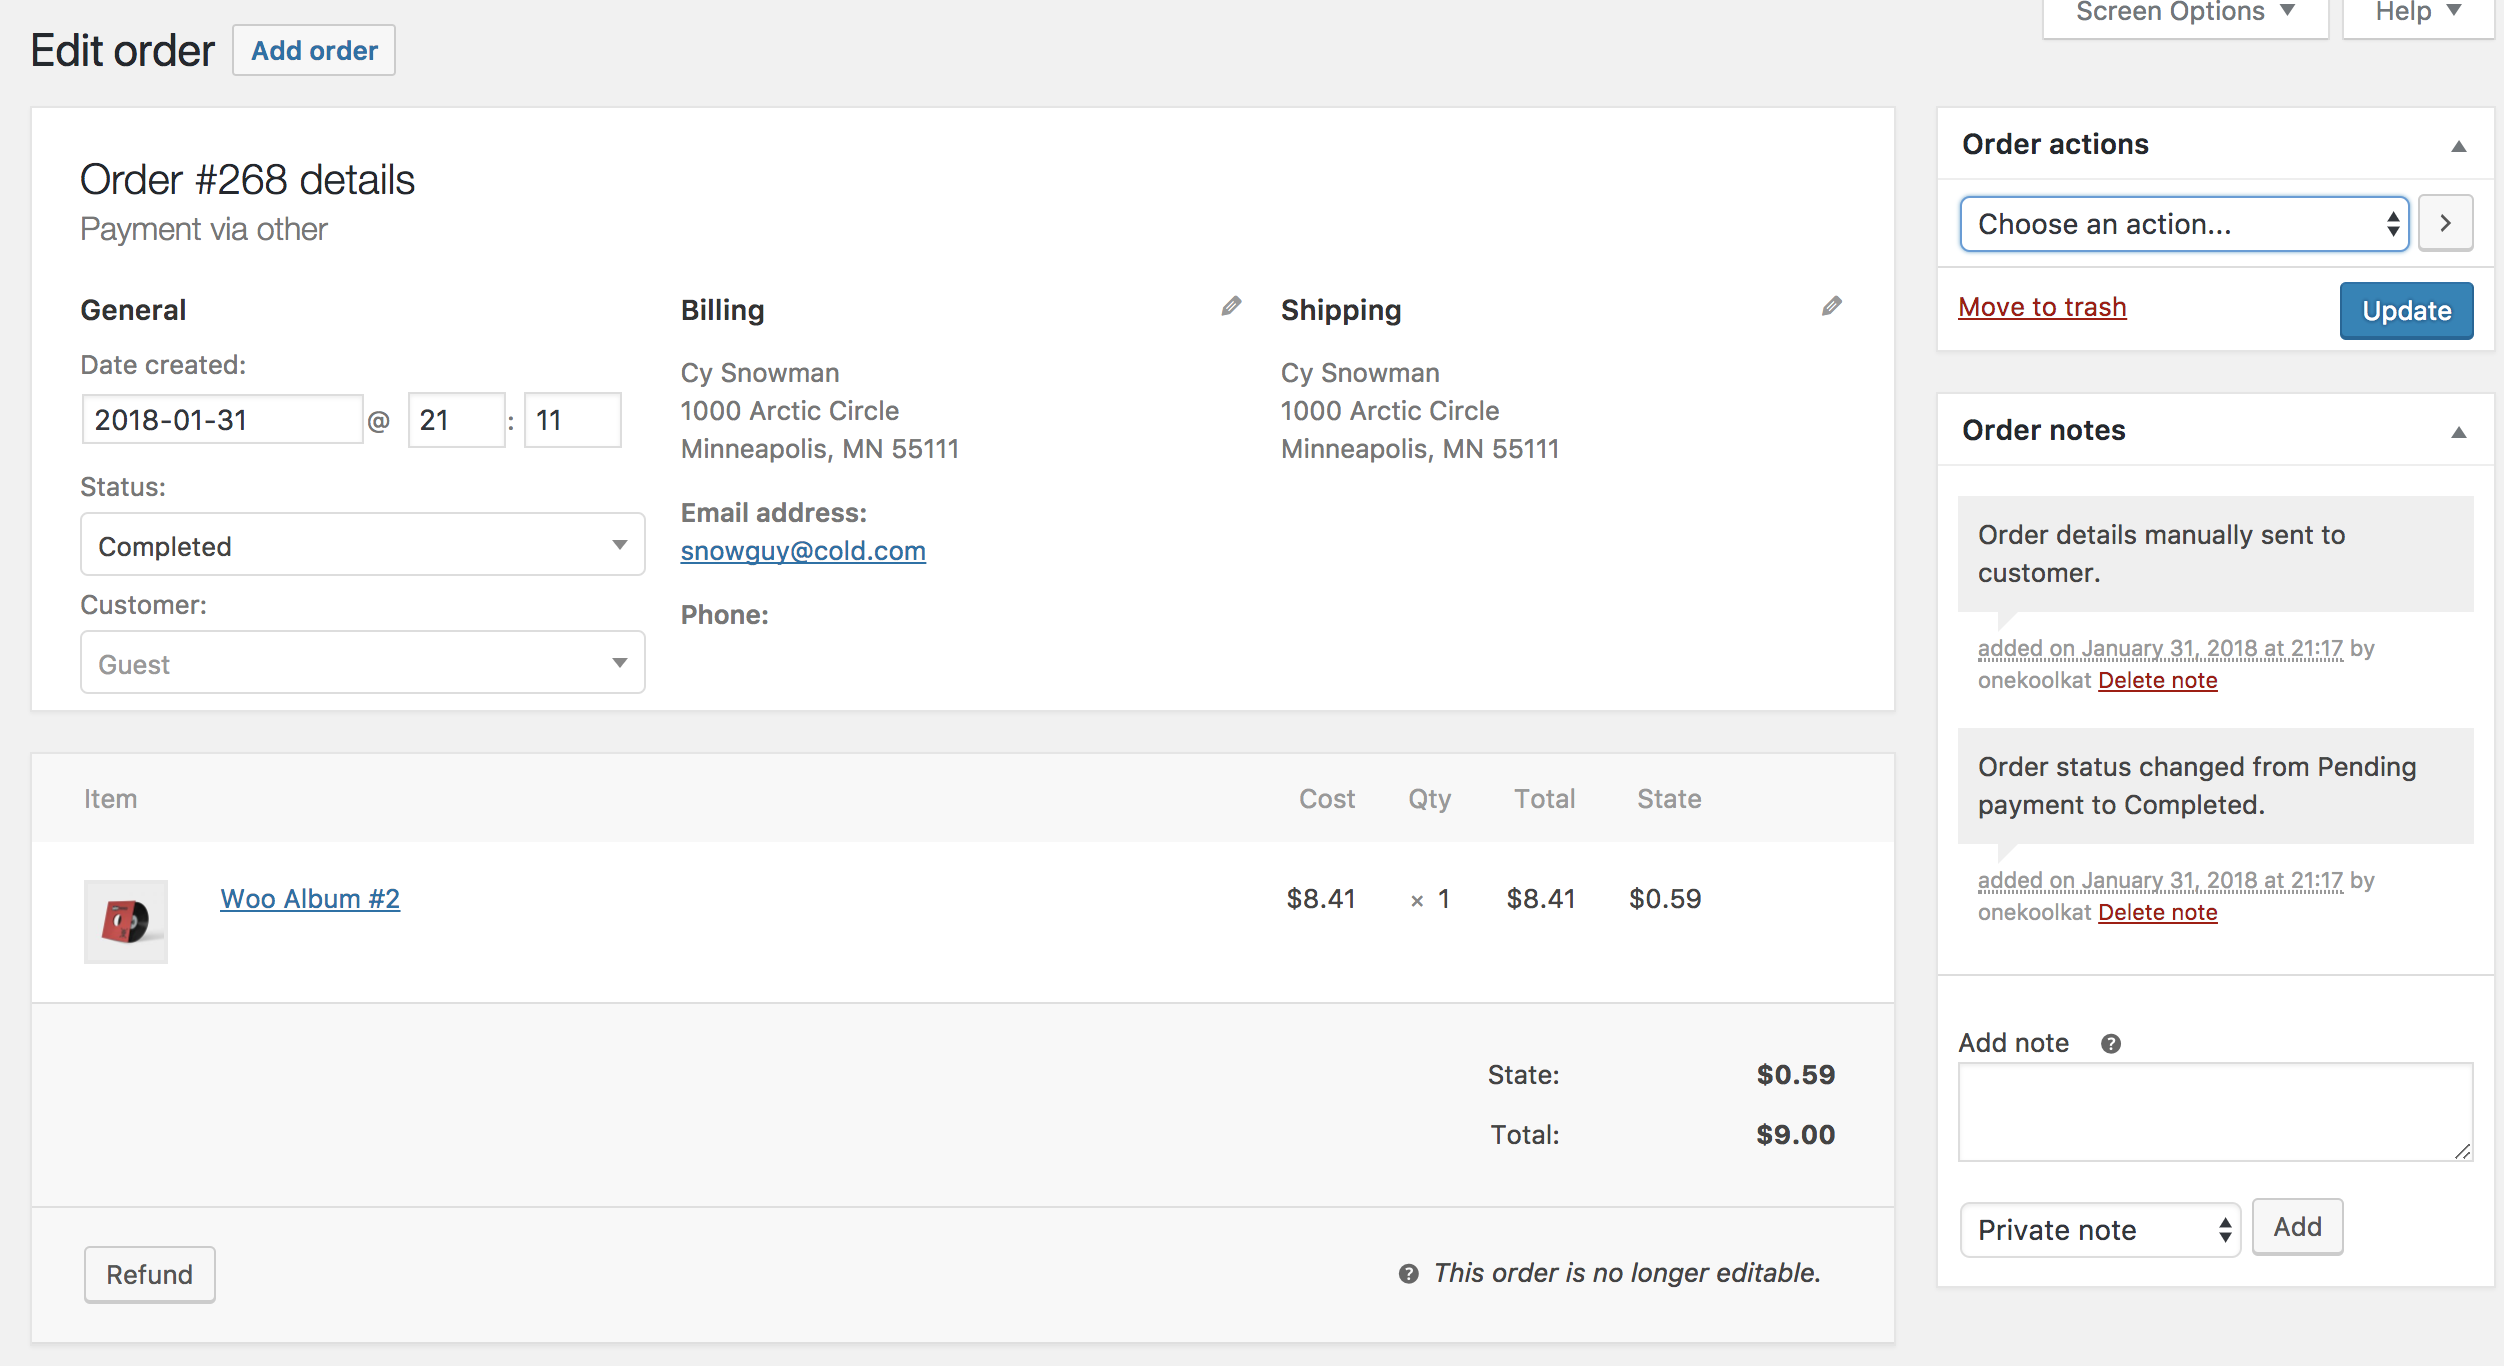 Woocommerce - Docs Single-order-page Docs - Single-order-page Single-order-page Woocommerce